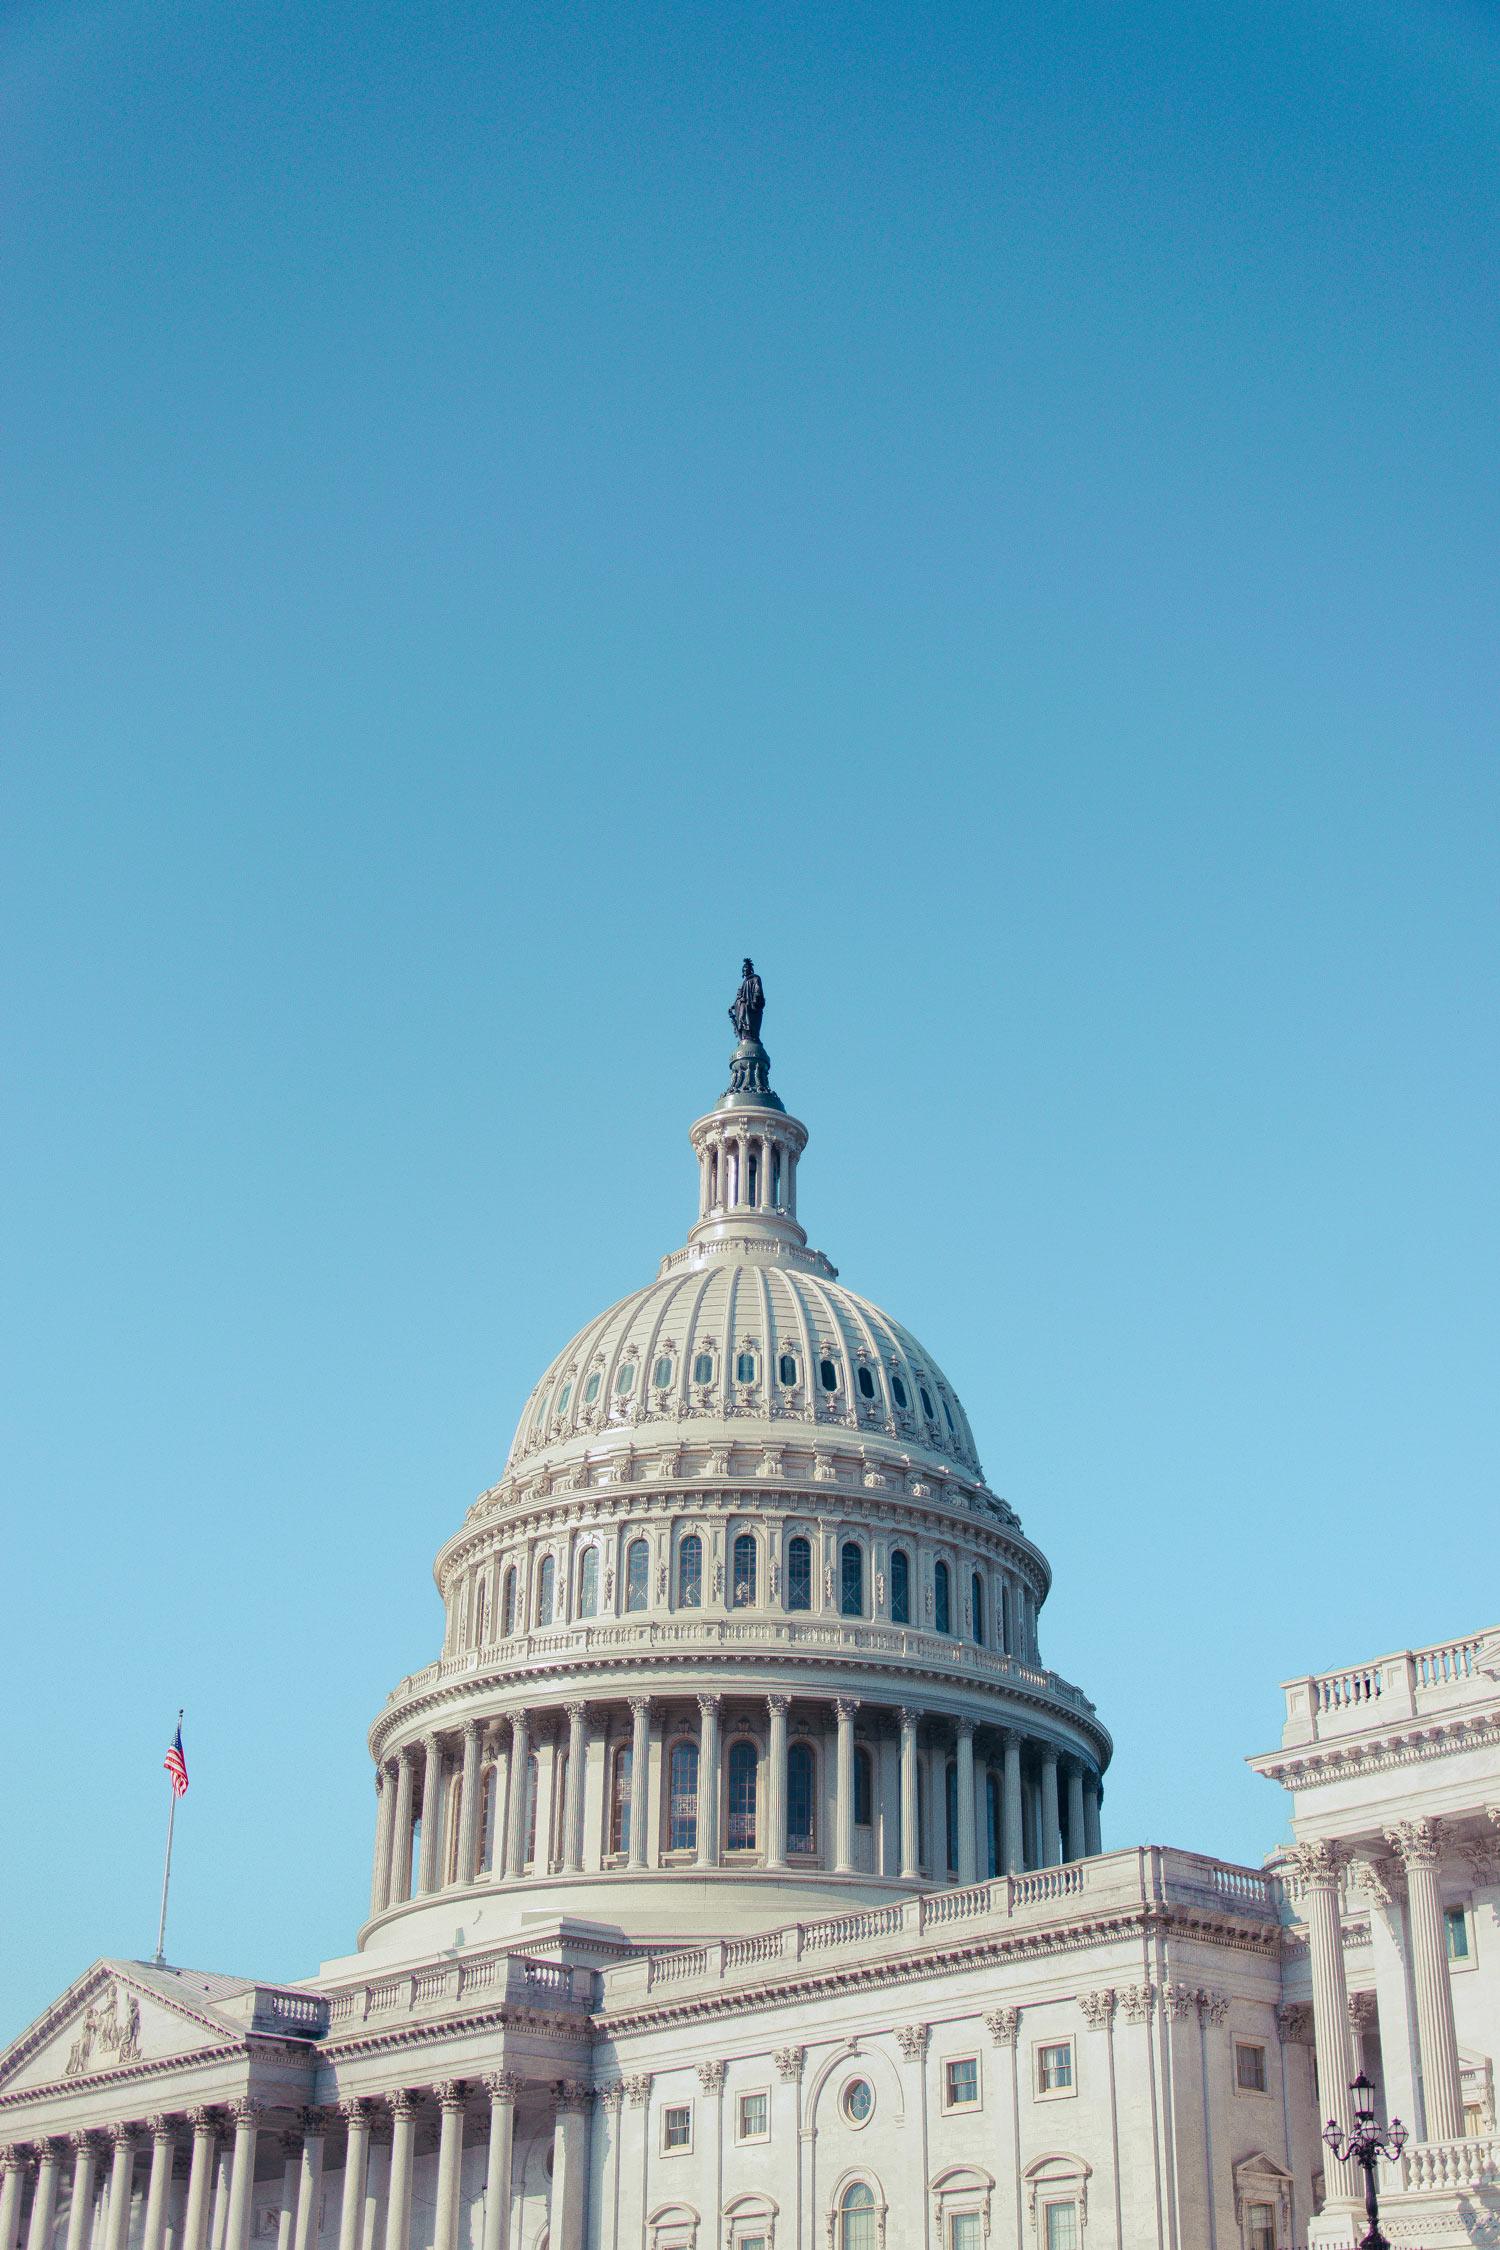 United_States_Capitol_Washington_DC_2018_Ruo_Ling_Lu.jpg